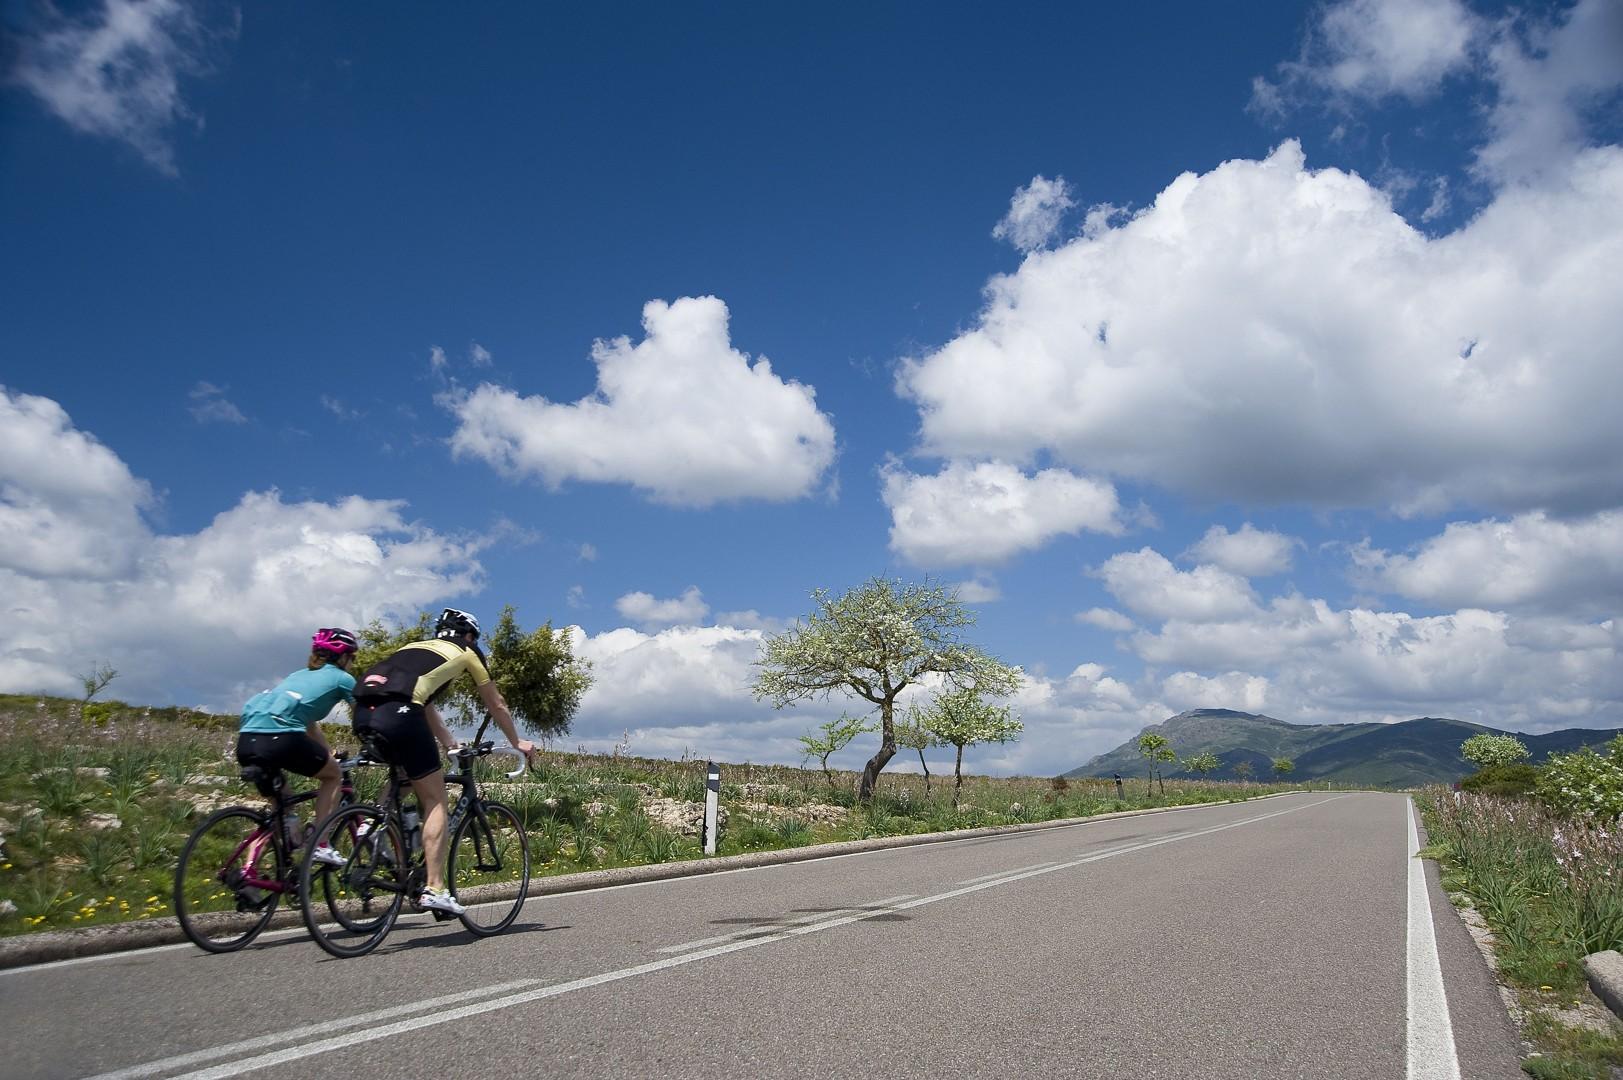 ESP2153.jpg - Italy - Sardinia - Mountain Explorer - Guided Road Cycling Holiday - Italia Road Cycling